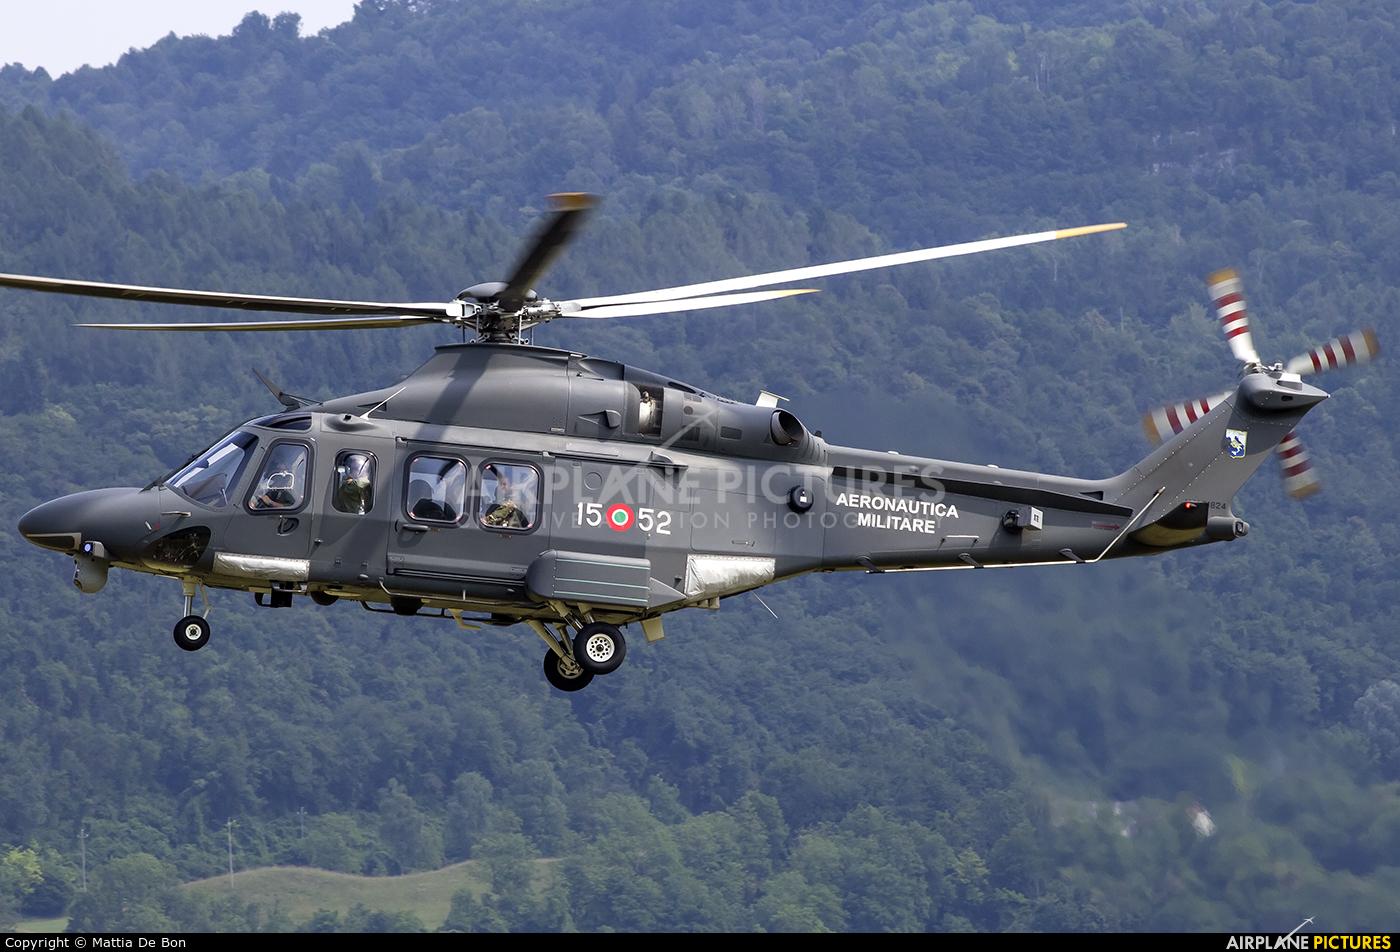 Italy - Air Force MM81824 aircraft at Belluno - Arturo Dell